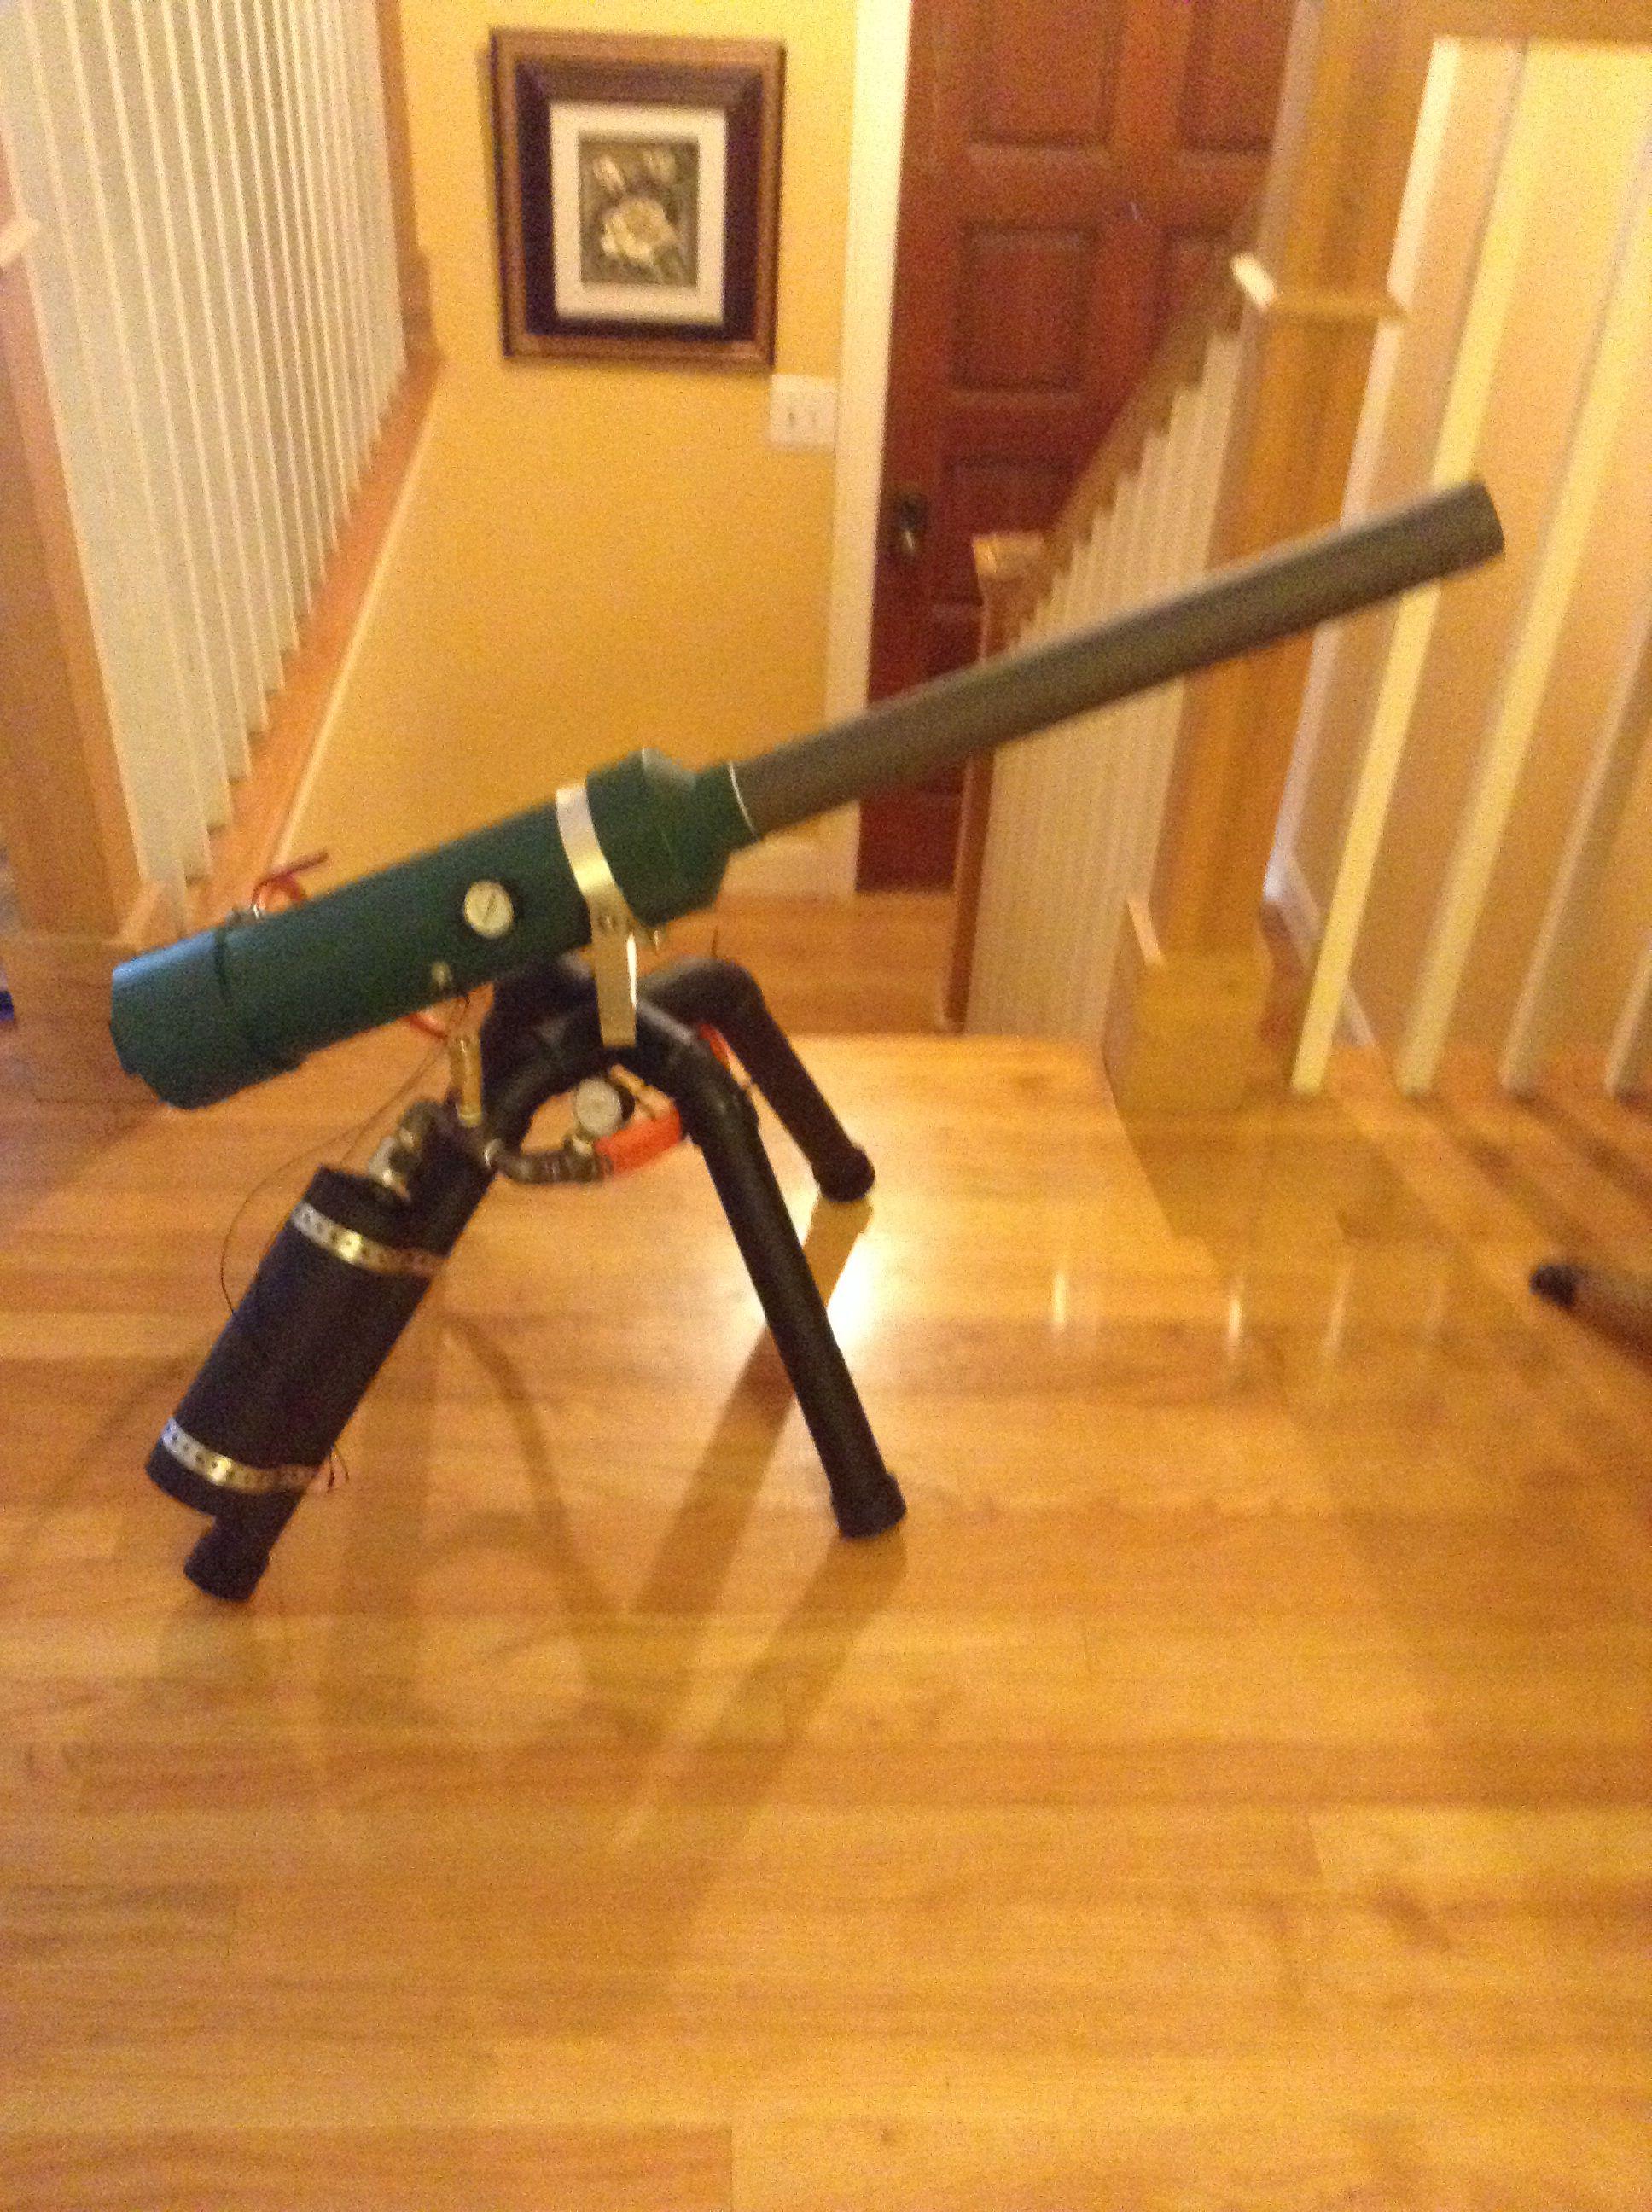 Propane cannon | Potato launcher | Air cannon, Homemade weapons, Guns